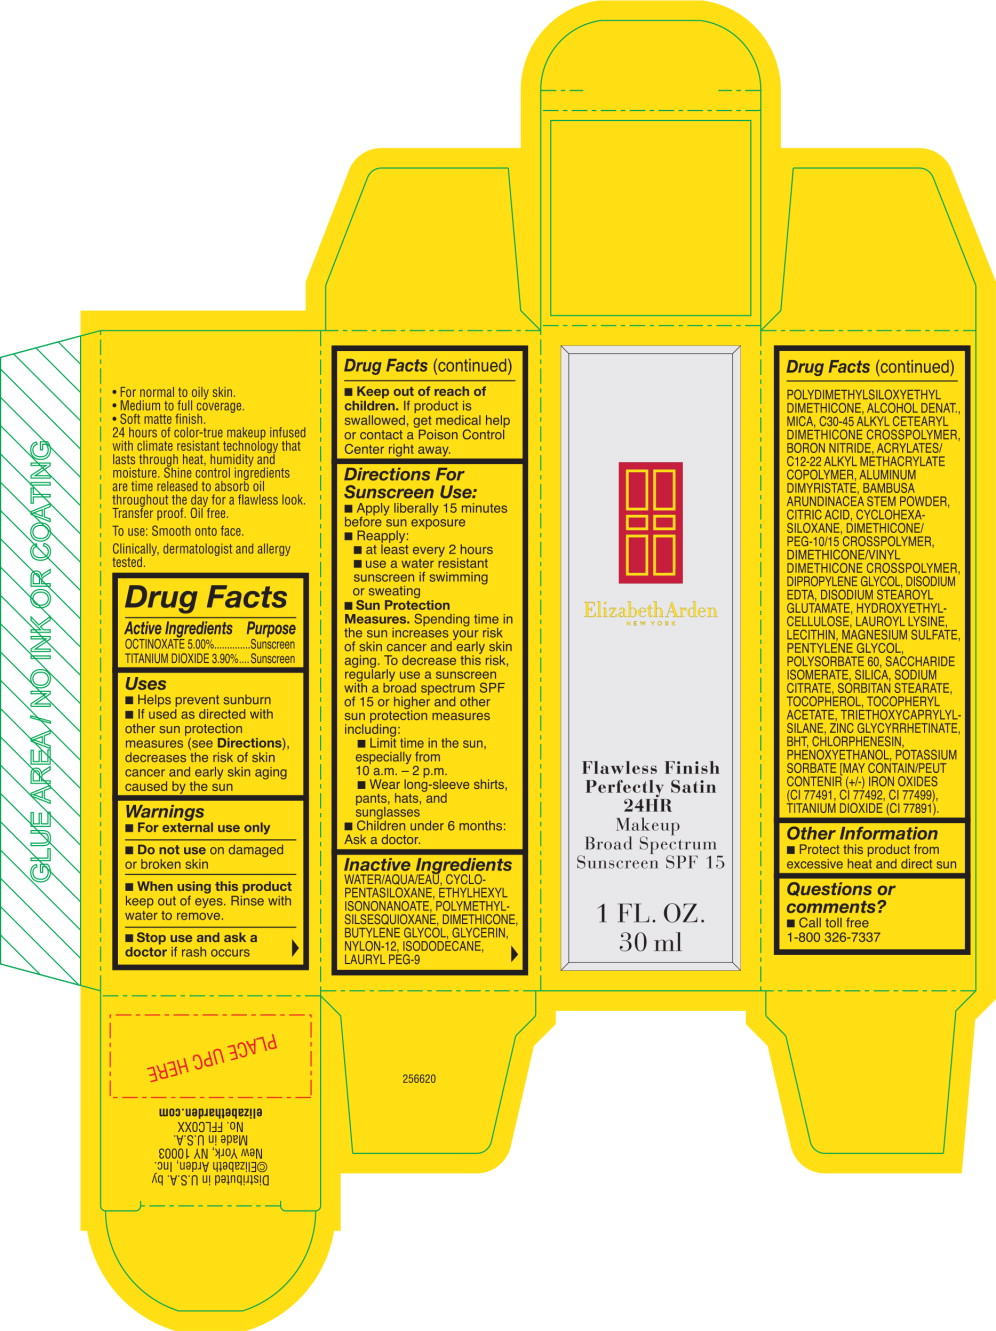 Flawless Finish Perfectly Satinb 24hr Makeup Shade Honey Beige (Octinoxate, Titanium Dioxide) Cream [Elizabeth Arden, Inc]